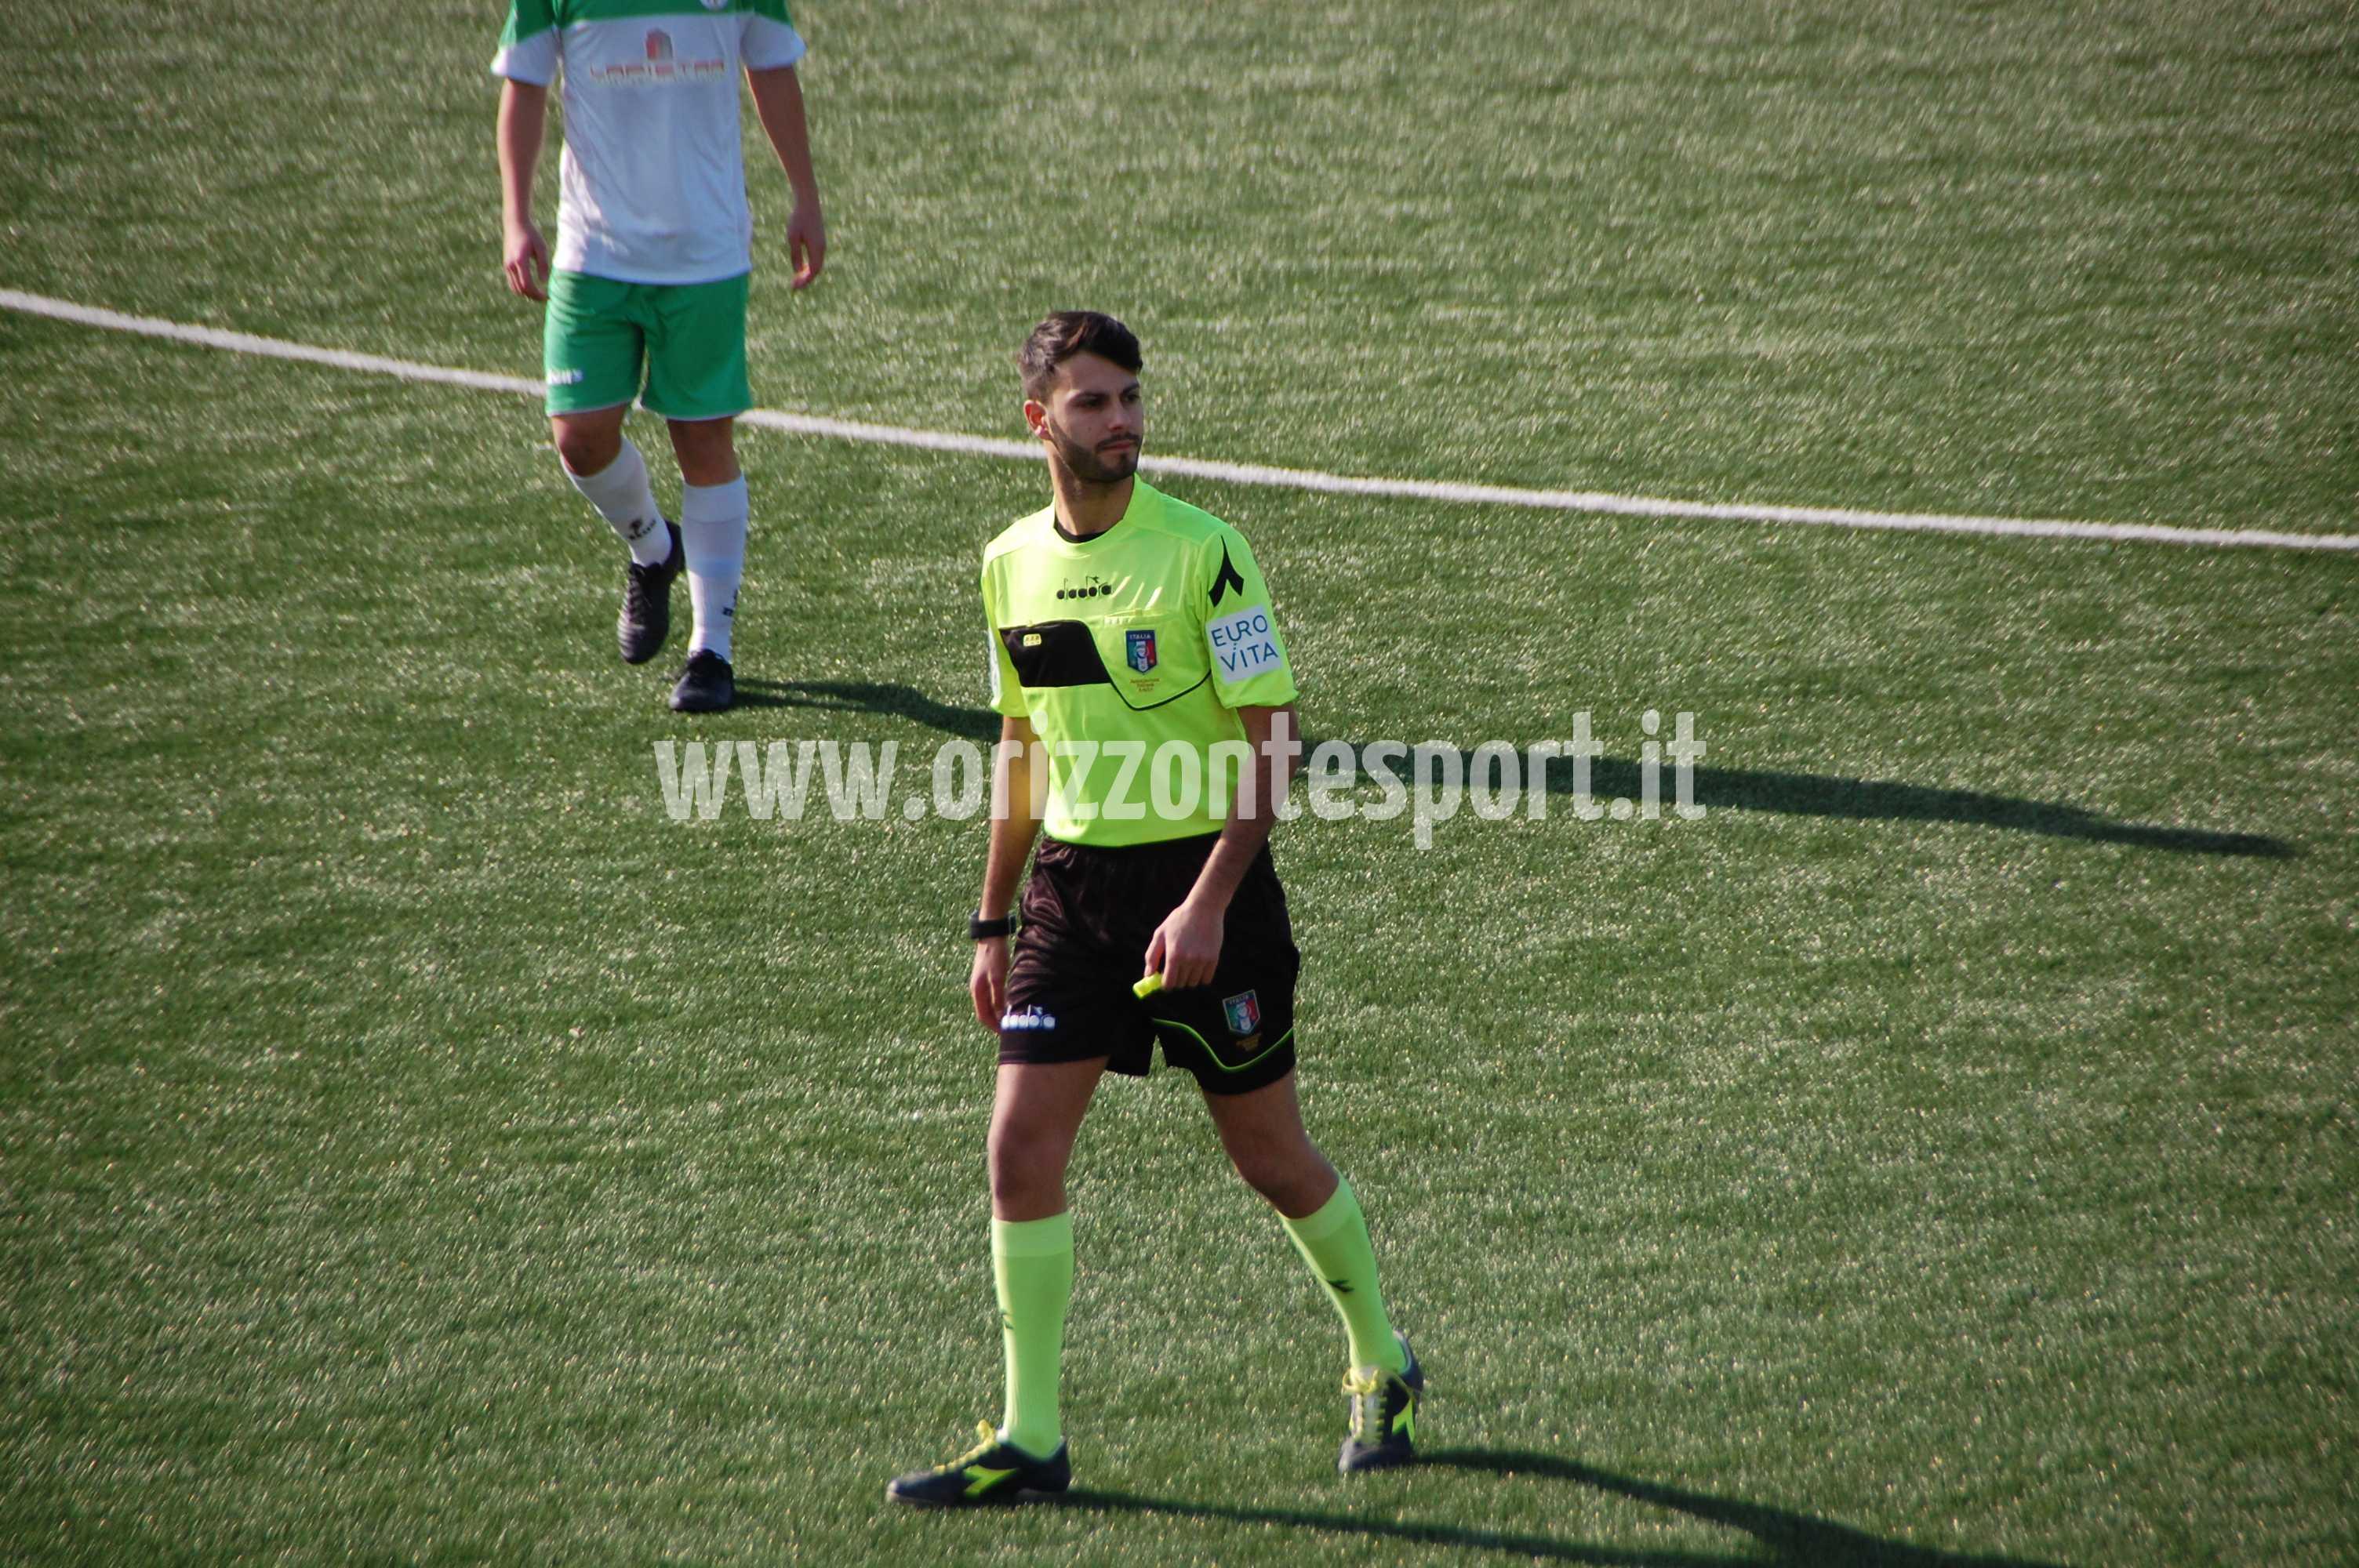 rossanese_belvedere (7)